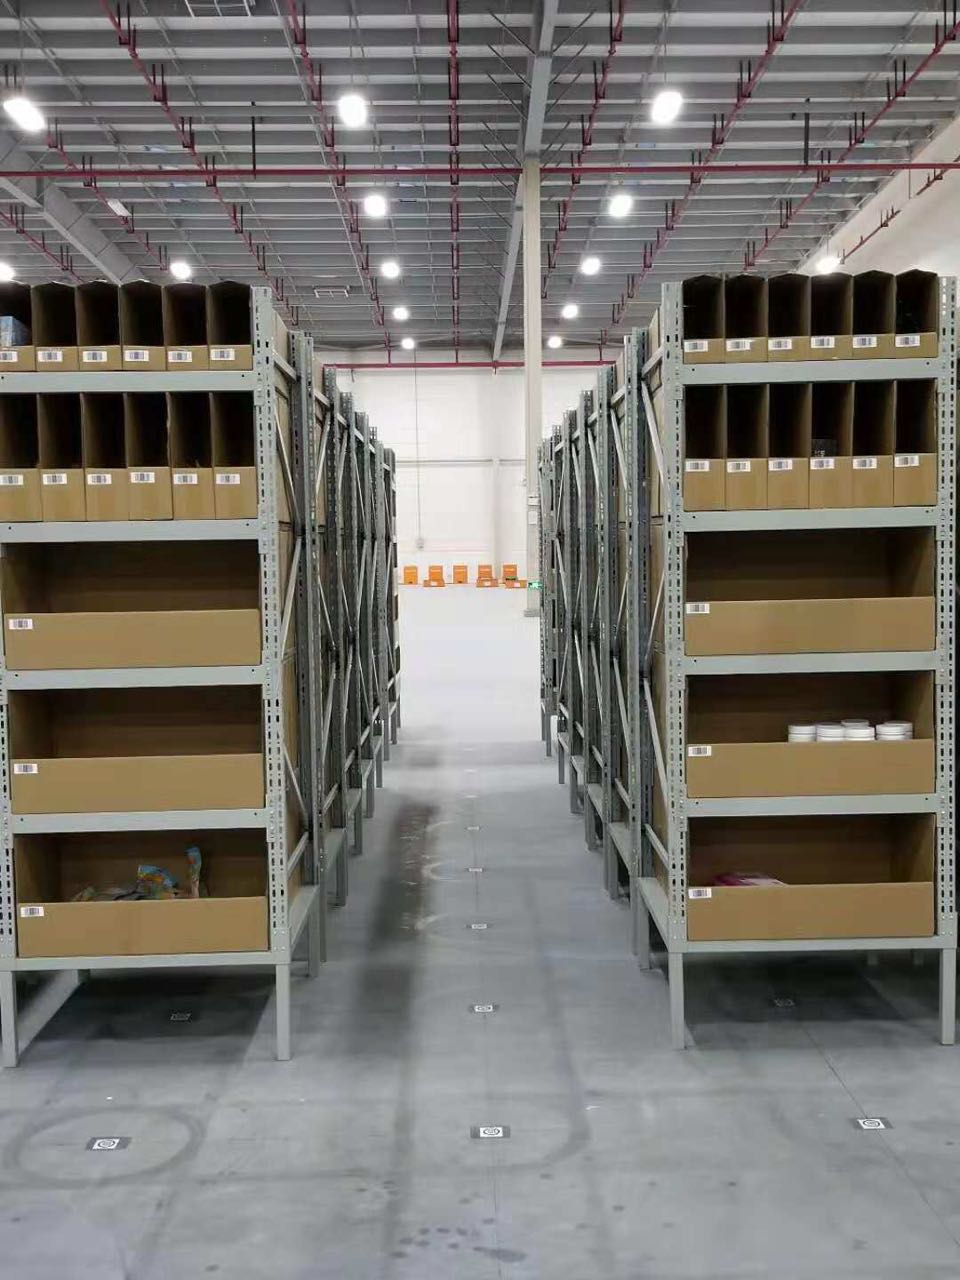 agv货架agv小车货架agv搬运货架agv智能货架